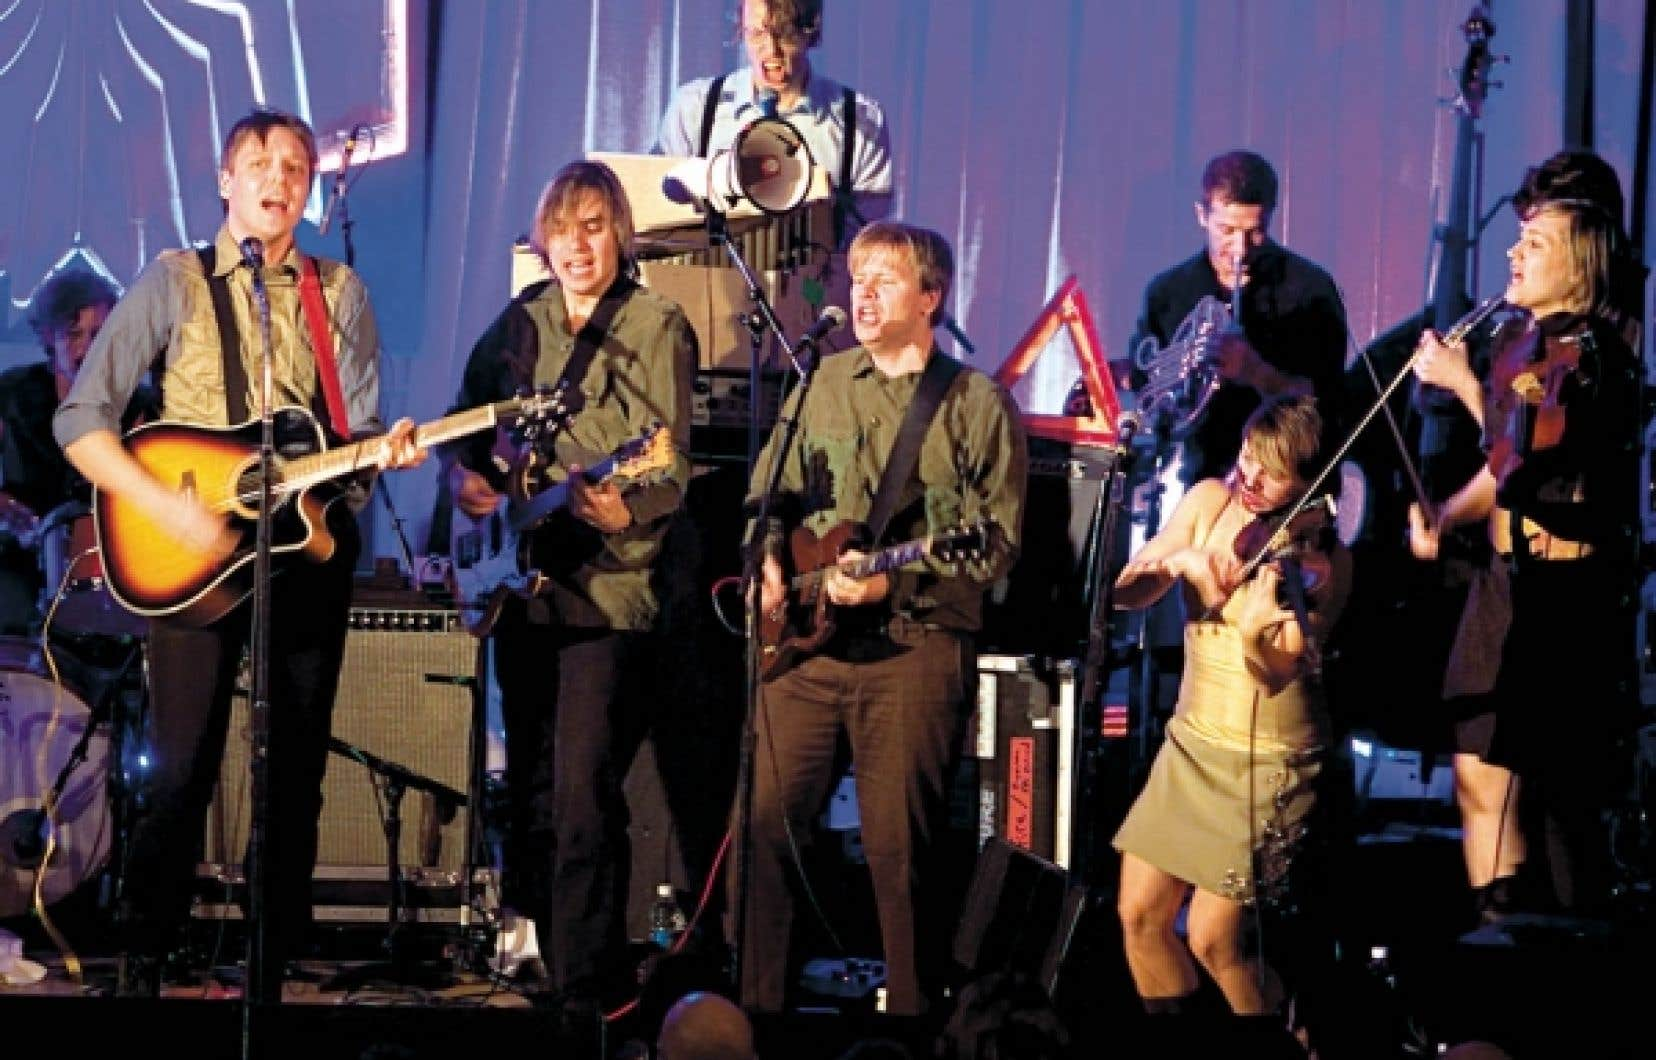 Arcade Fire présentera son spectacle au festival Osheaga ce soir à 21h30.